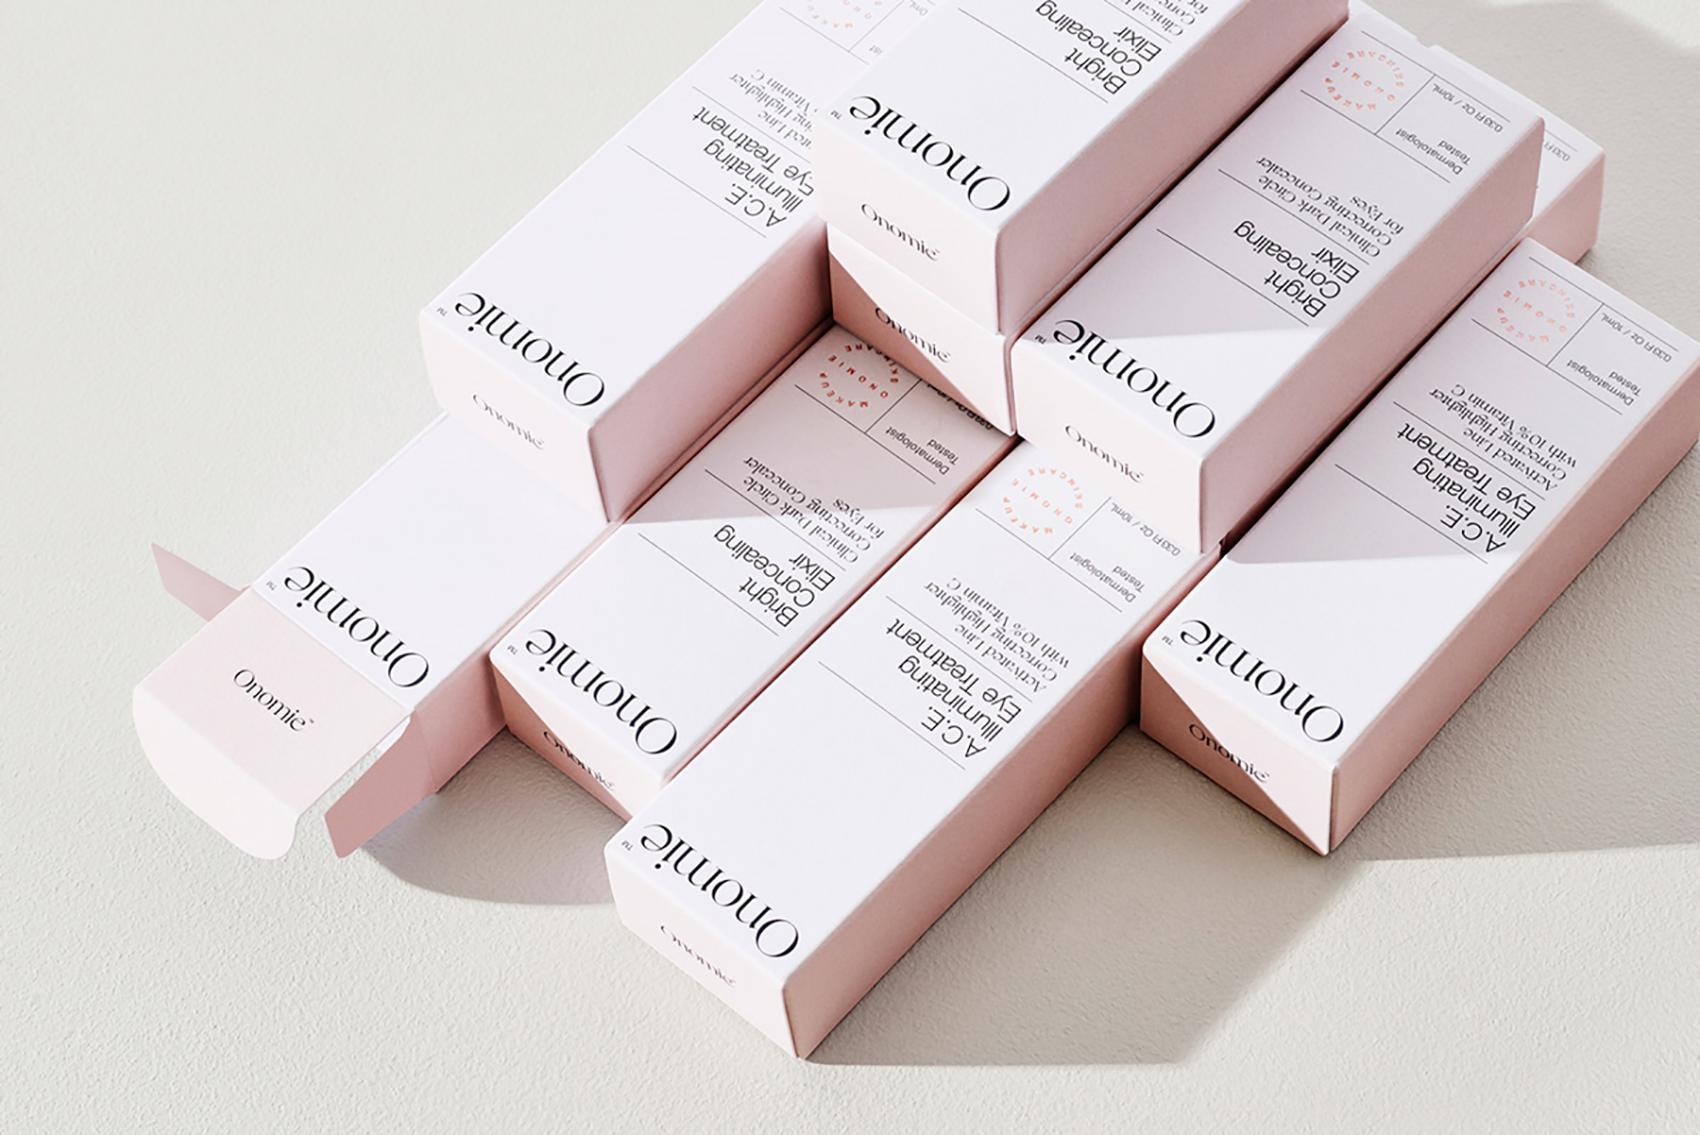 Onomie-Sharp-Type-Packaging-2